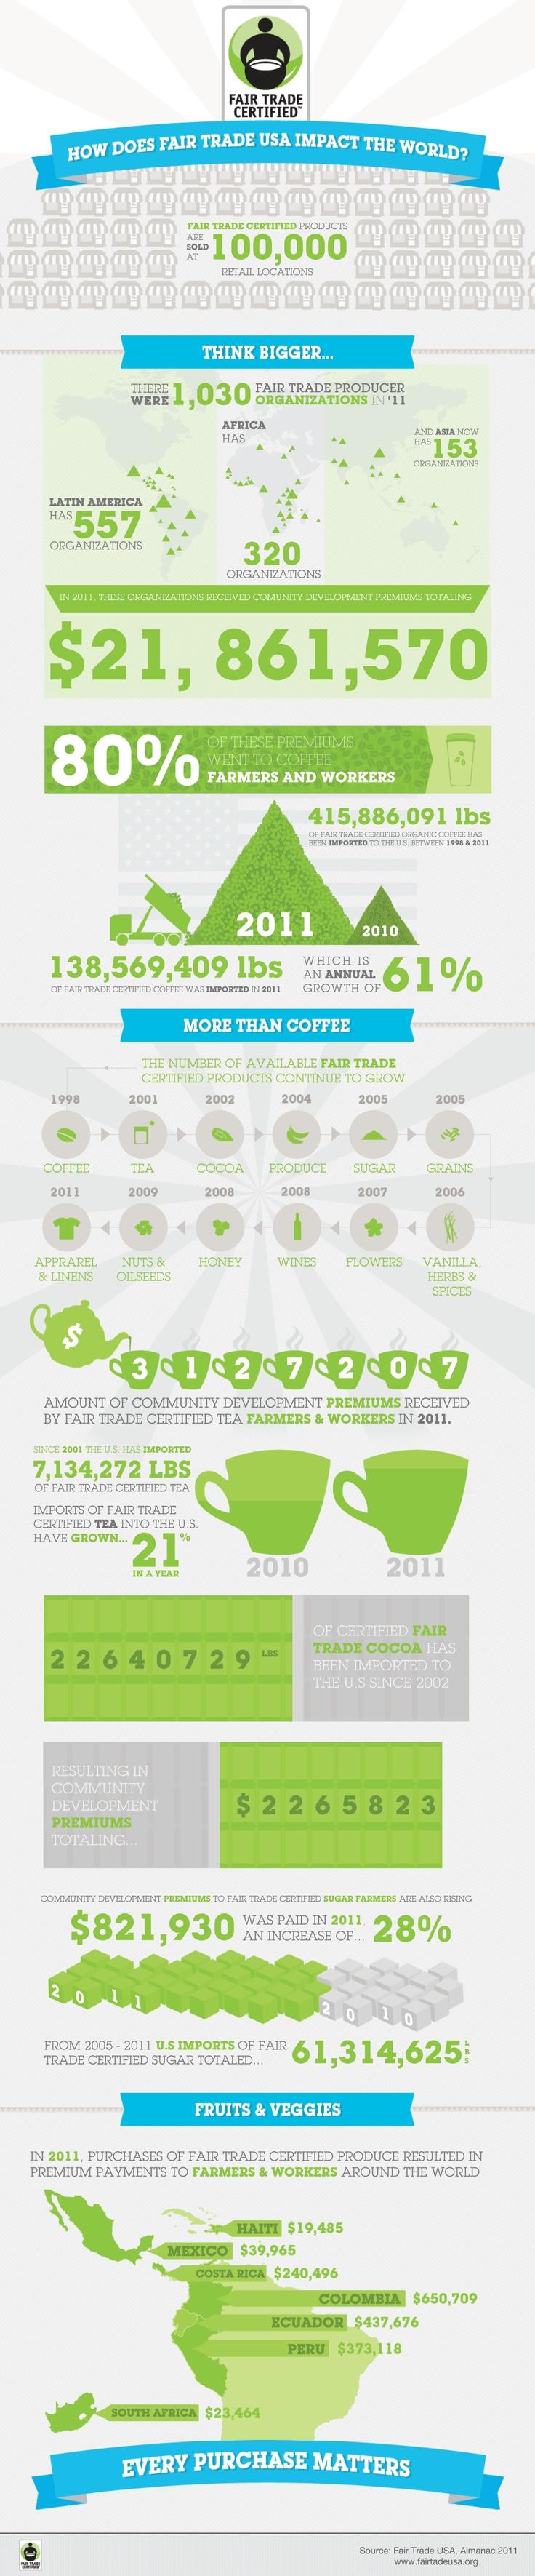 Socioeconomic effects of coffee trade on